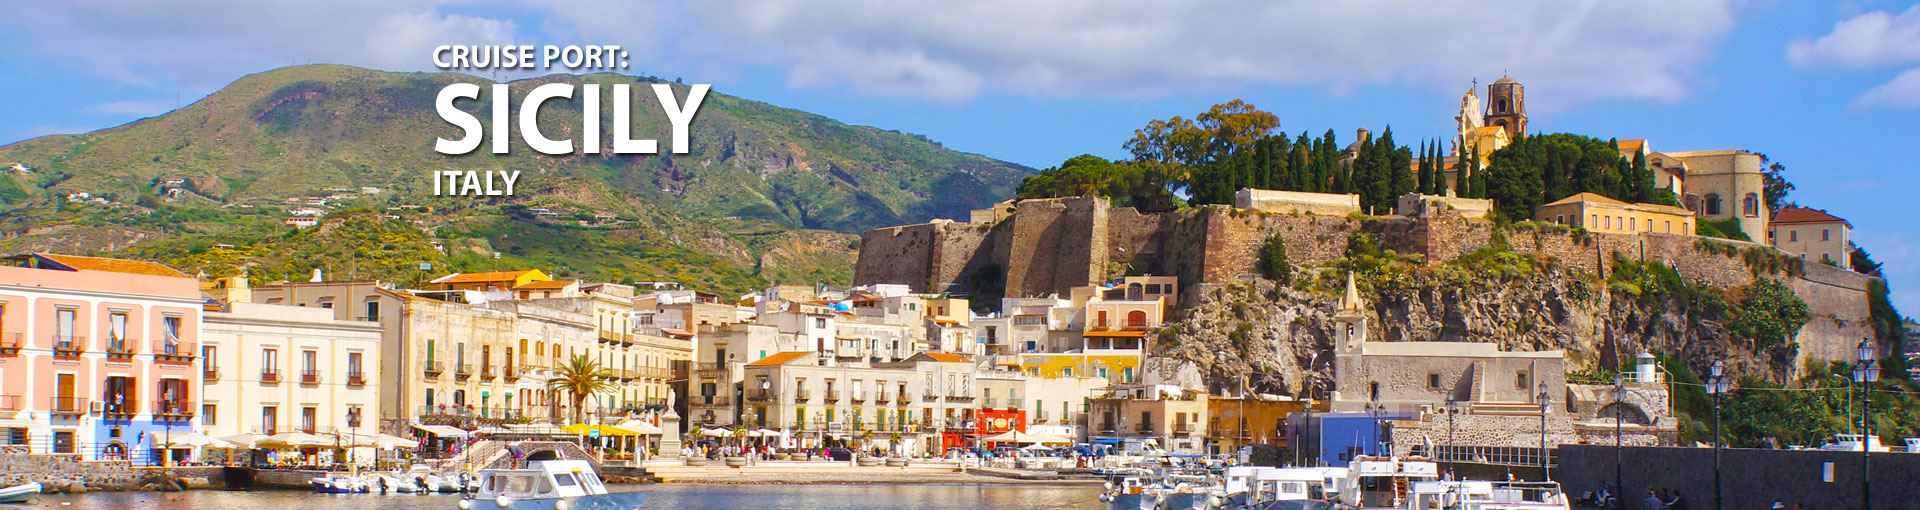 Cruises to Sicily, Italy